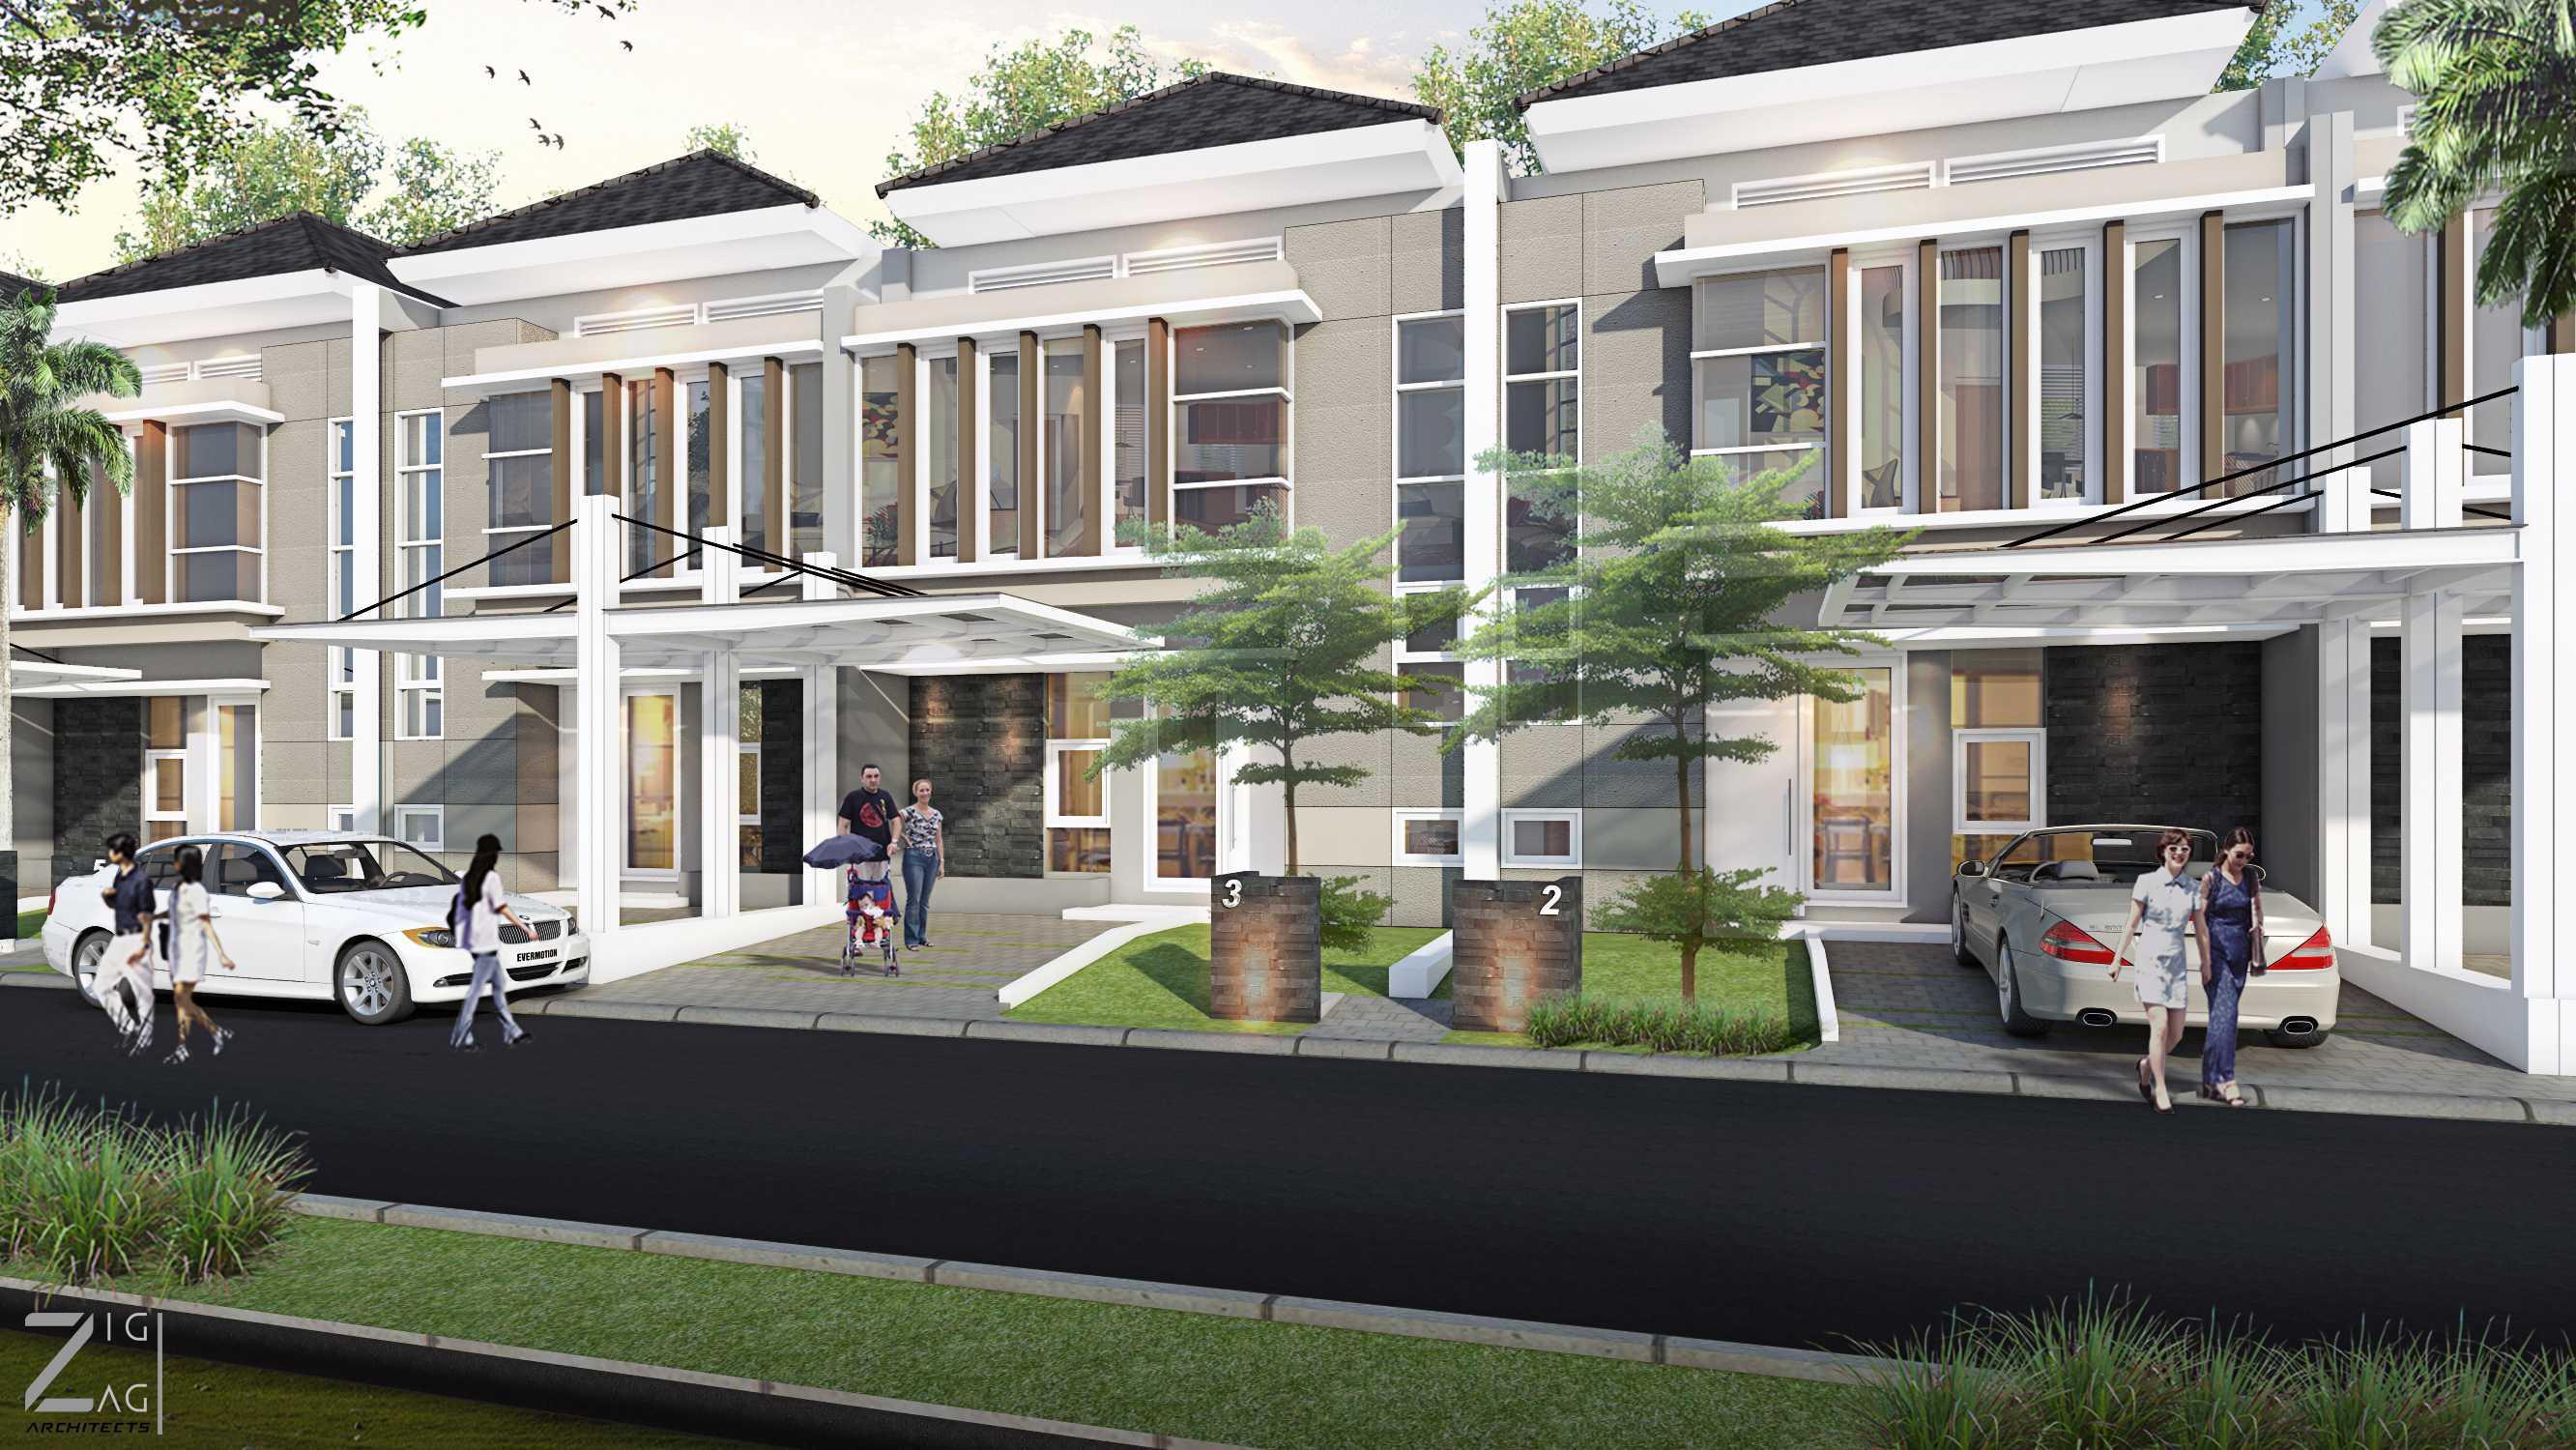 Zigzag Architecture Studio Kedaung Townhouse Kota Tgr. Sel., Kota Tangerang Selatan, Banten, Indonesia Kota Tgr. Sel., Kota Tangerang Selatan, Banten, Indonesia Viewdalam-52Logo   37062